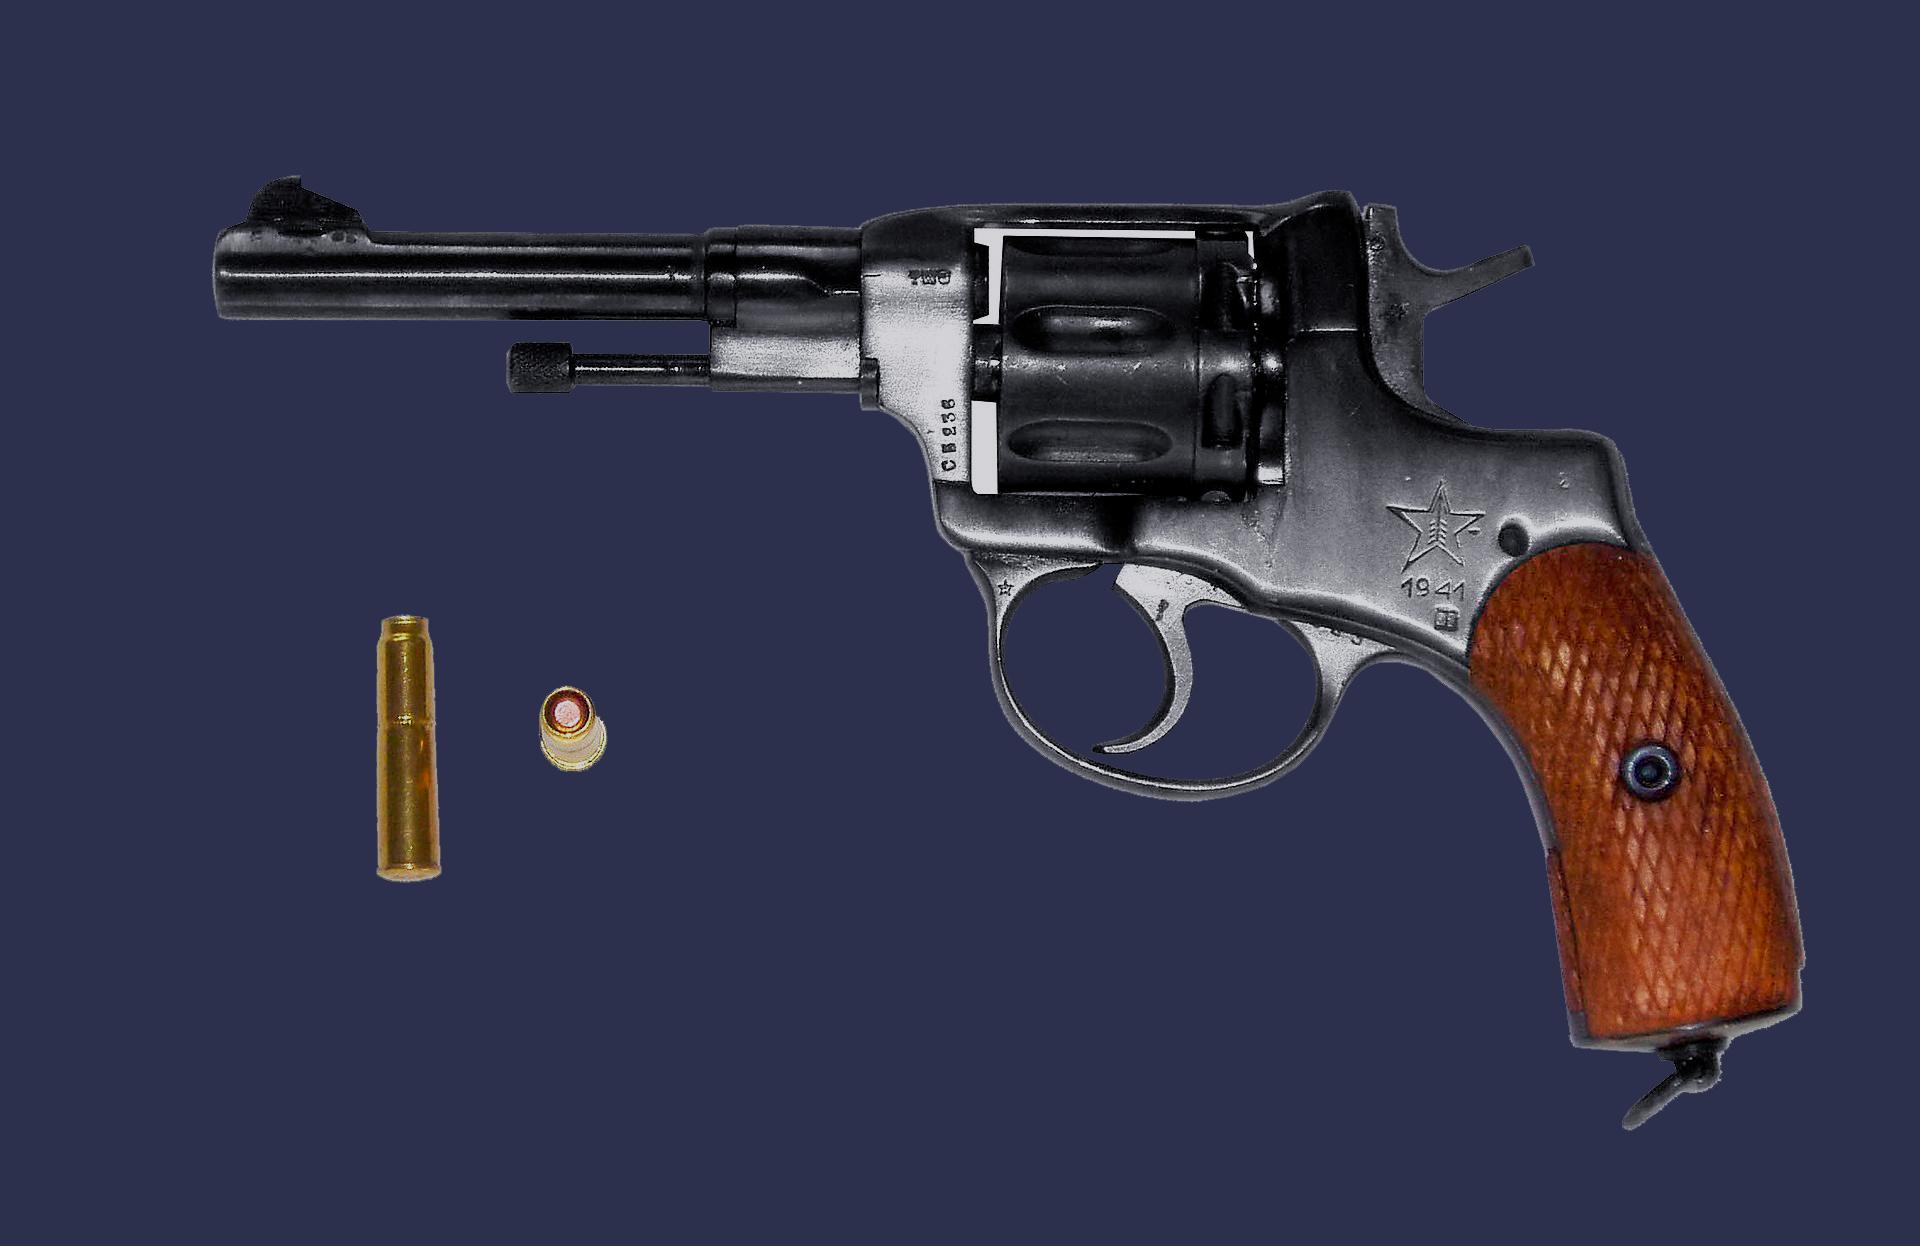 Револьвер системы Нагана. Фото © Wikipedia